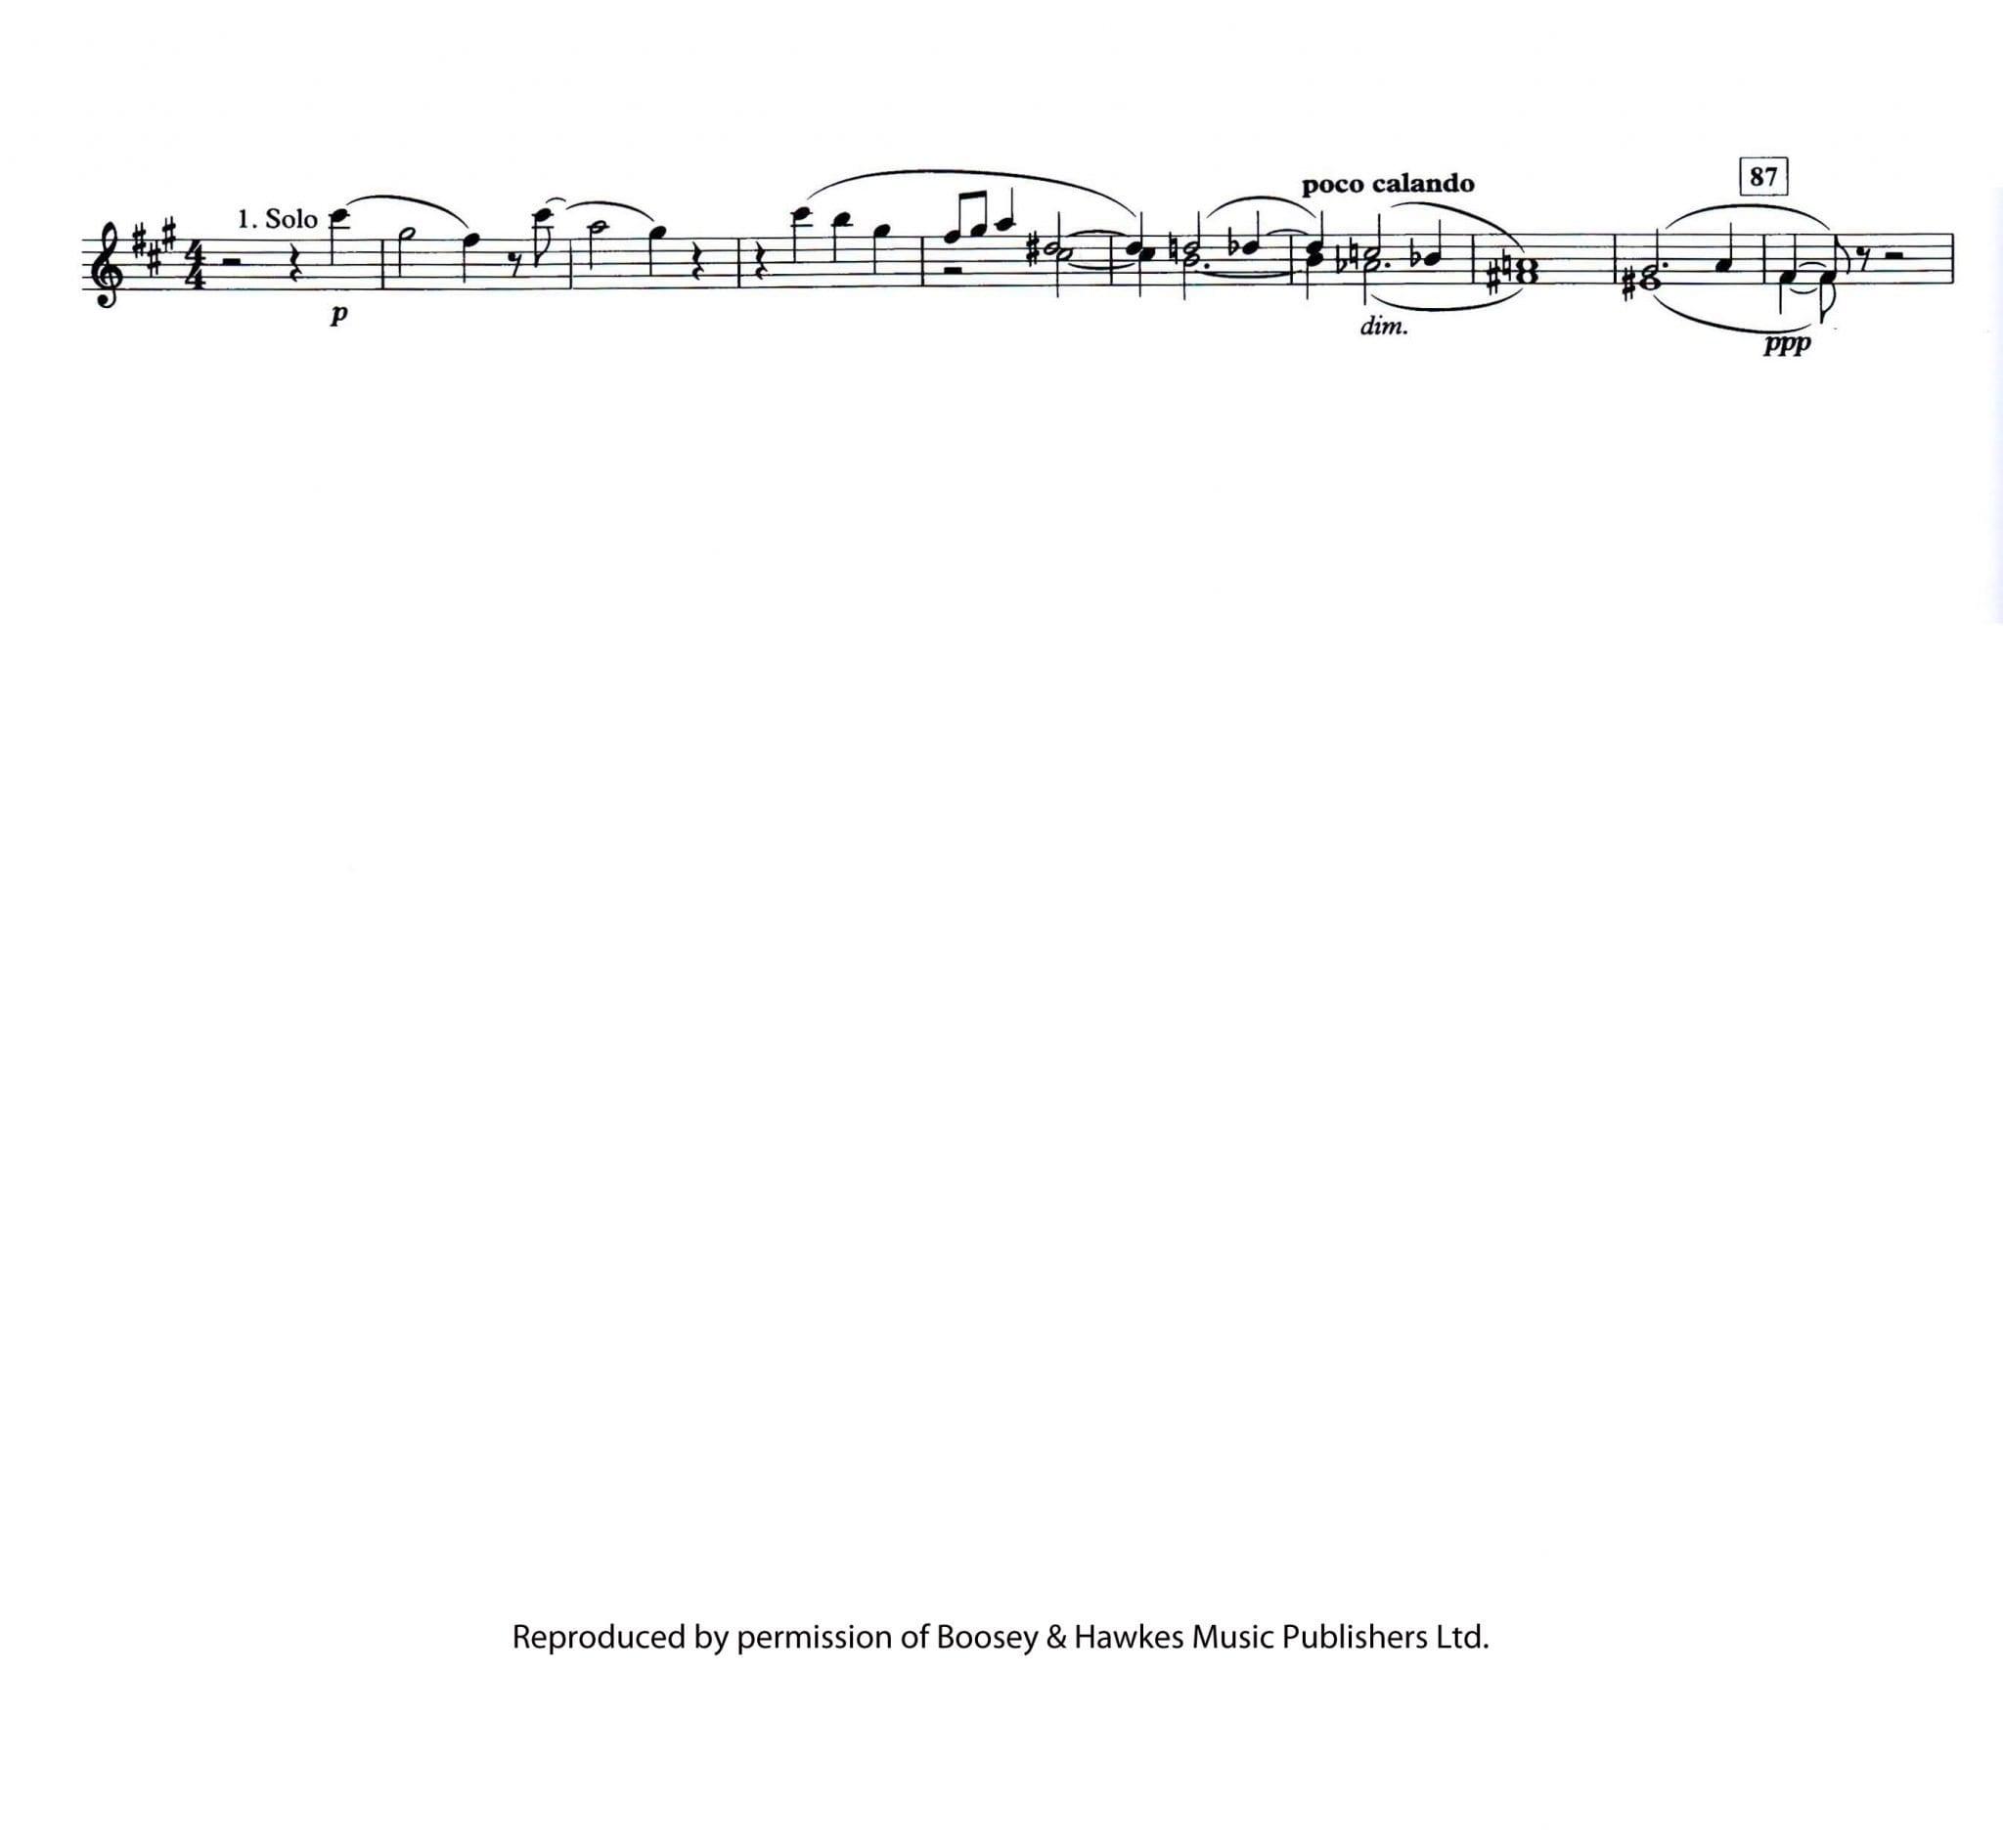 Shostakovich Symphony No 5 Mvt 3 pt 2 - Principal Chairs